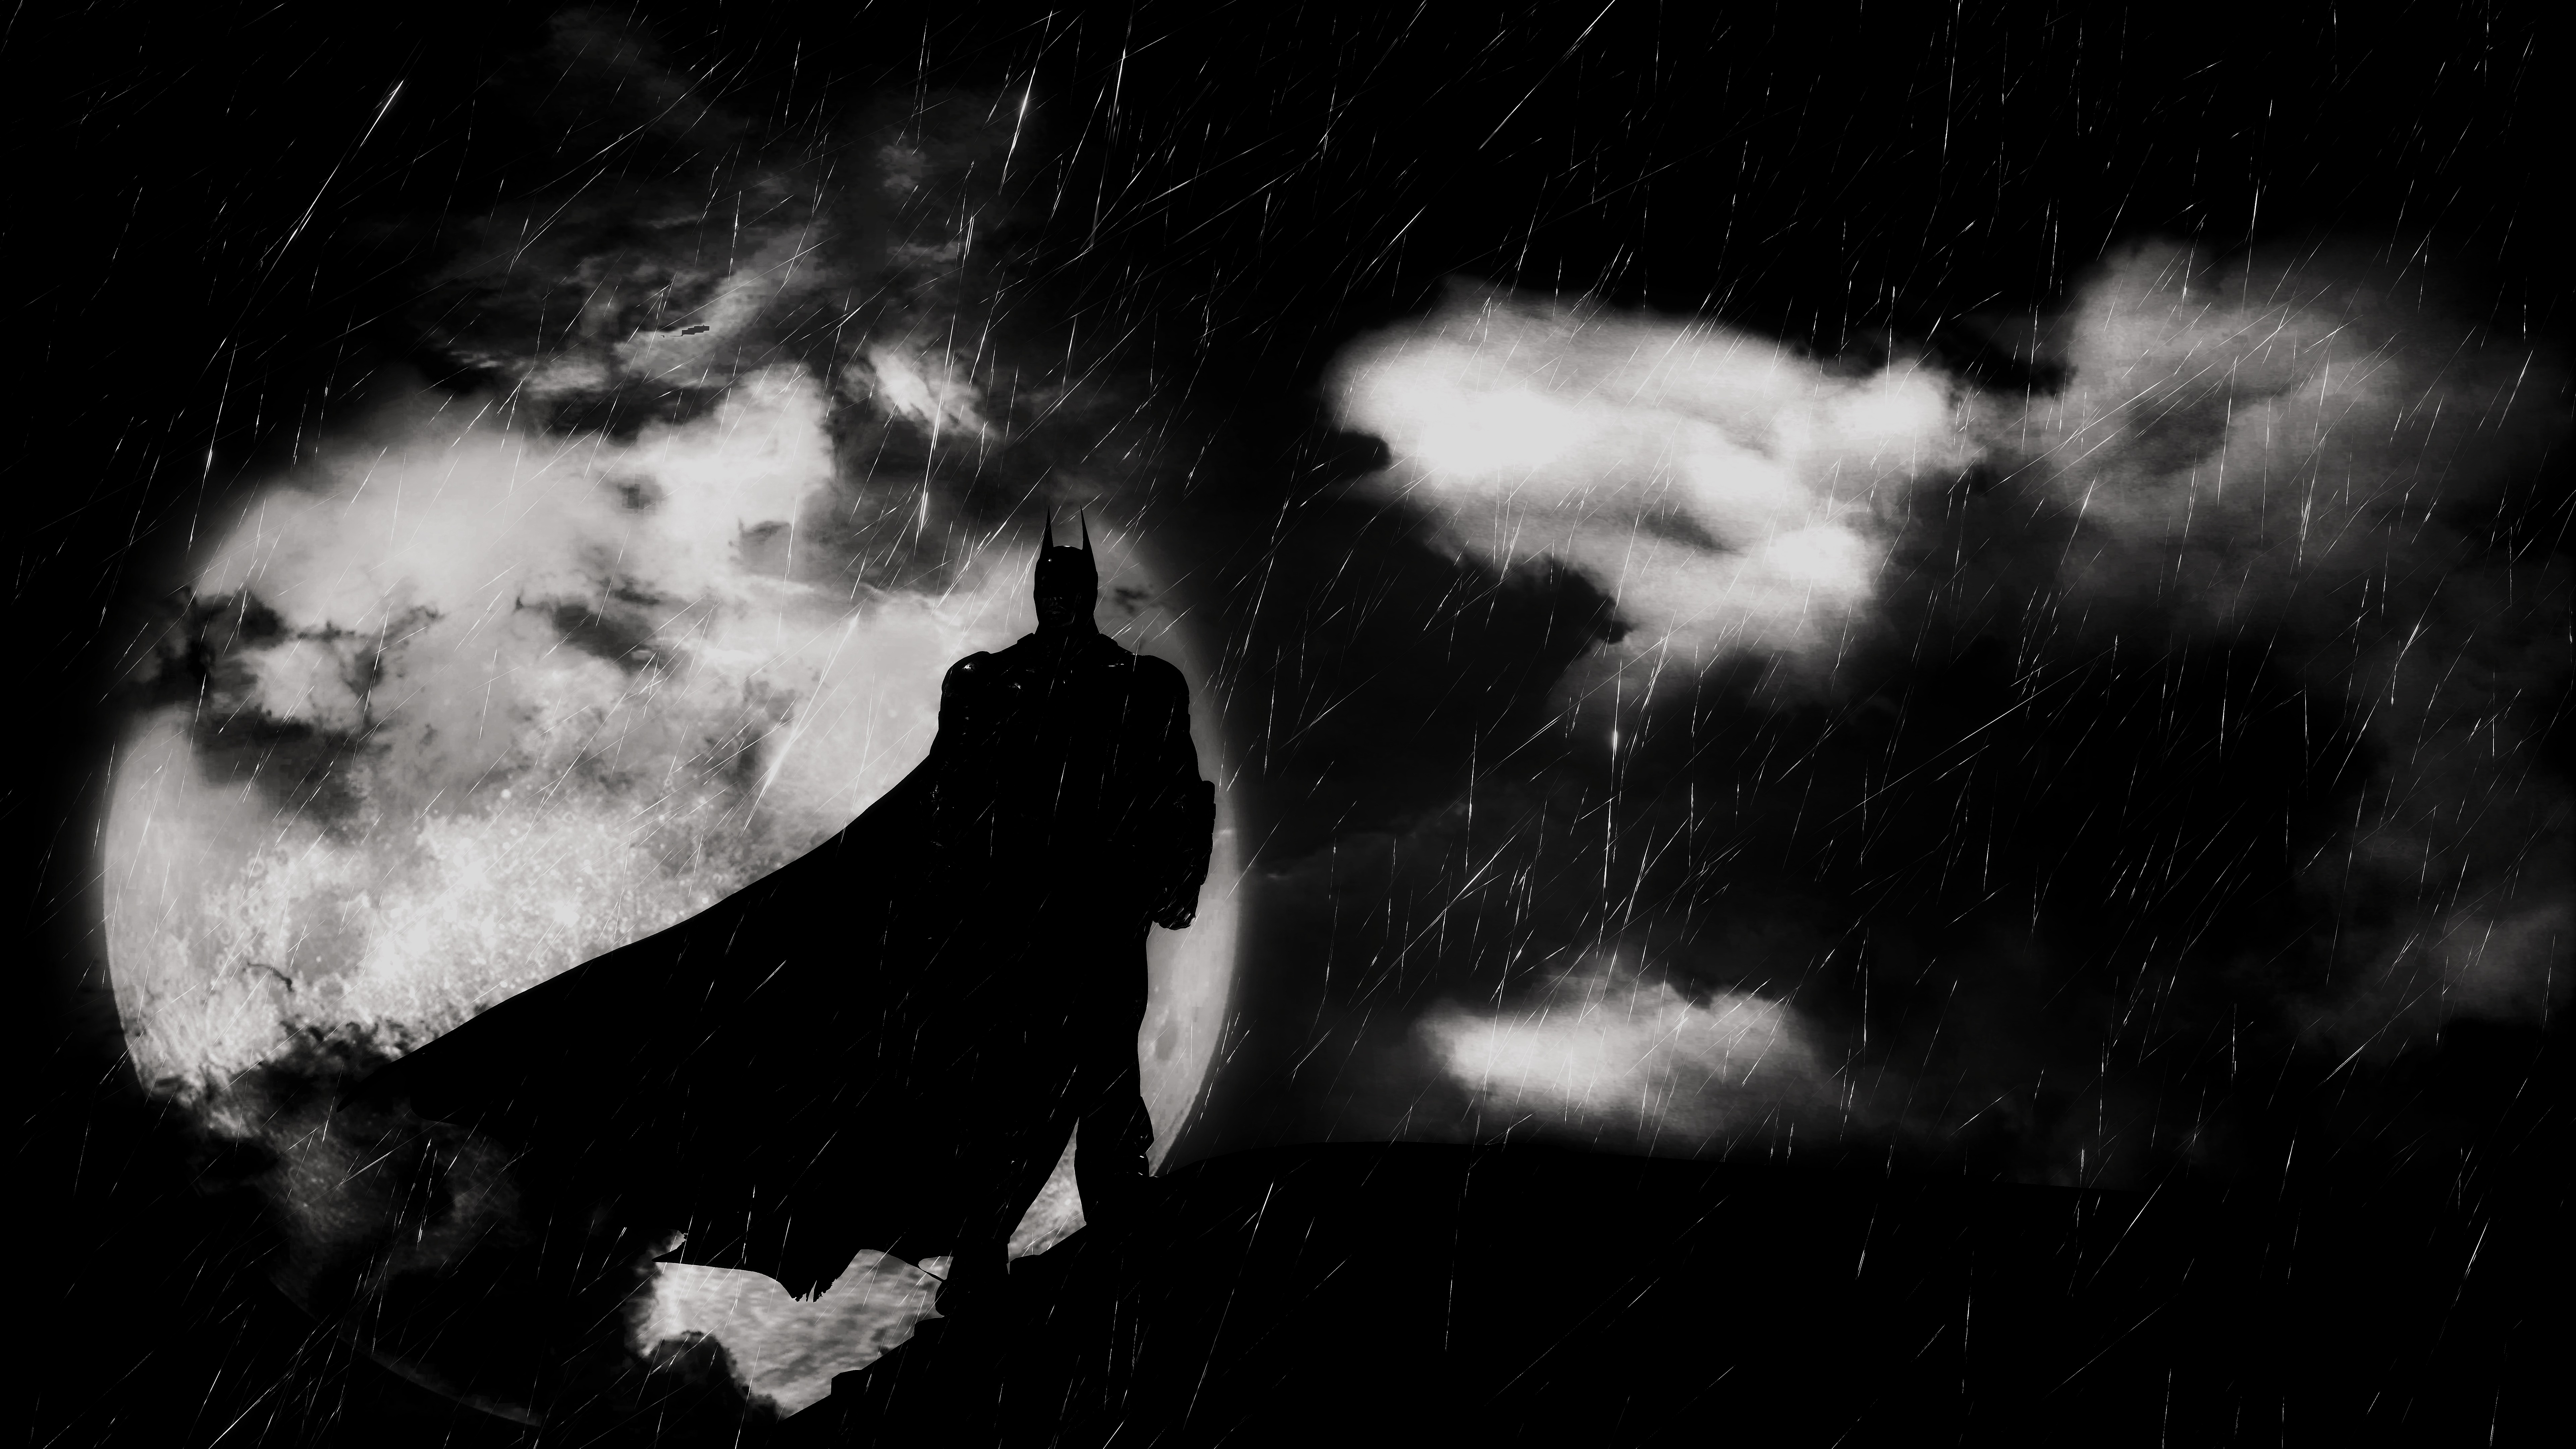 Batman Arkham Knight 8k, HD Games, 4k Wallpapers, Images ...